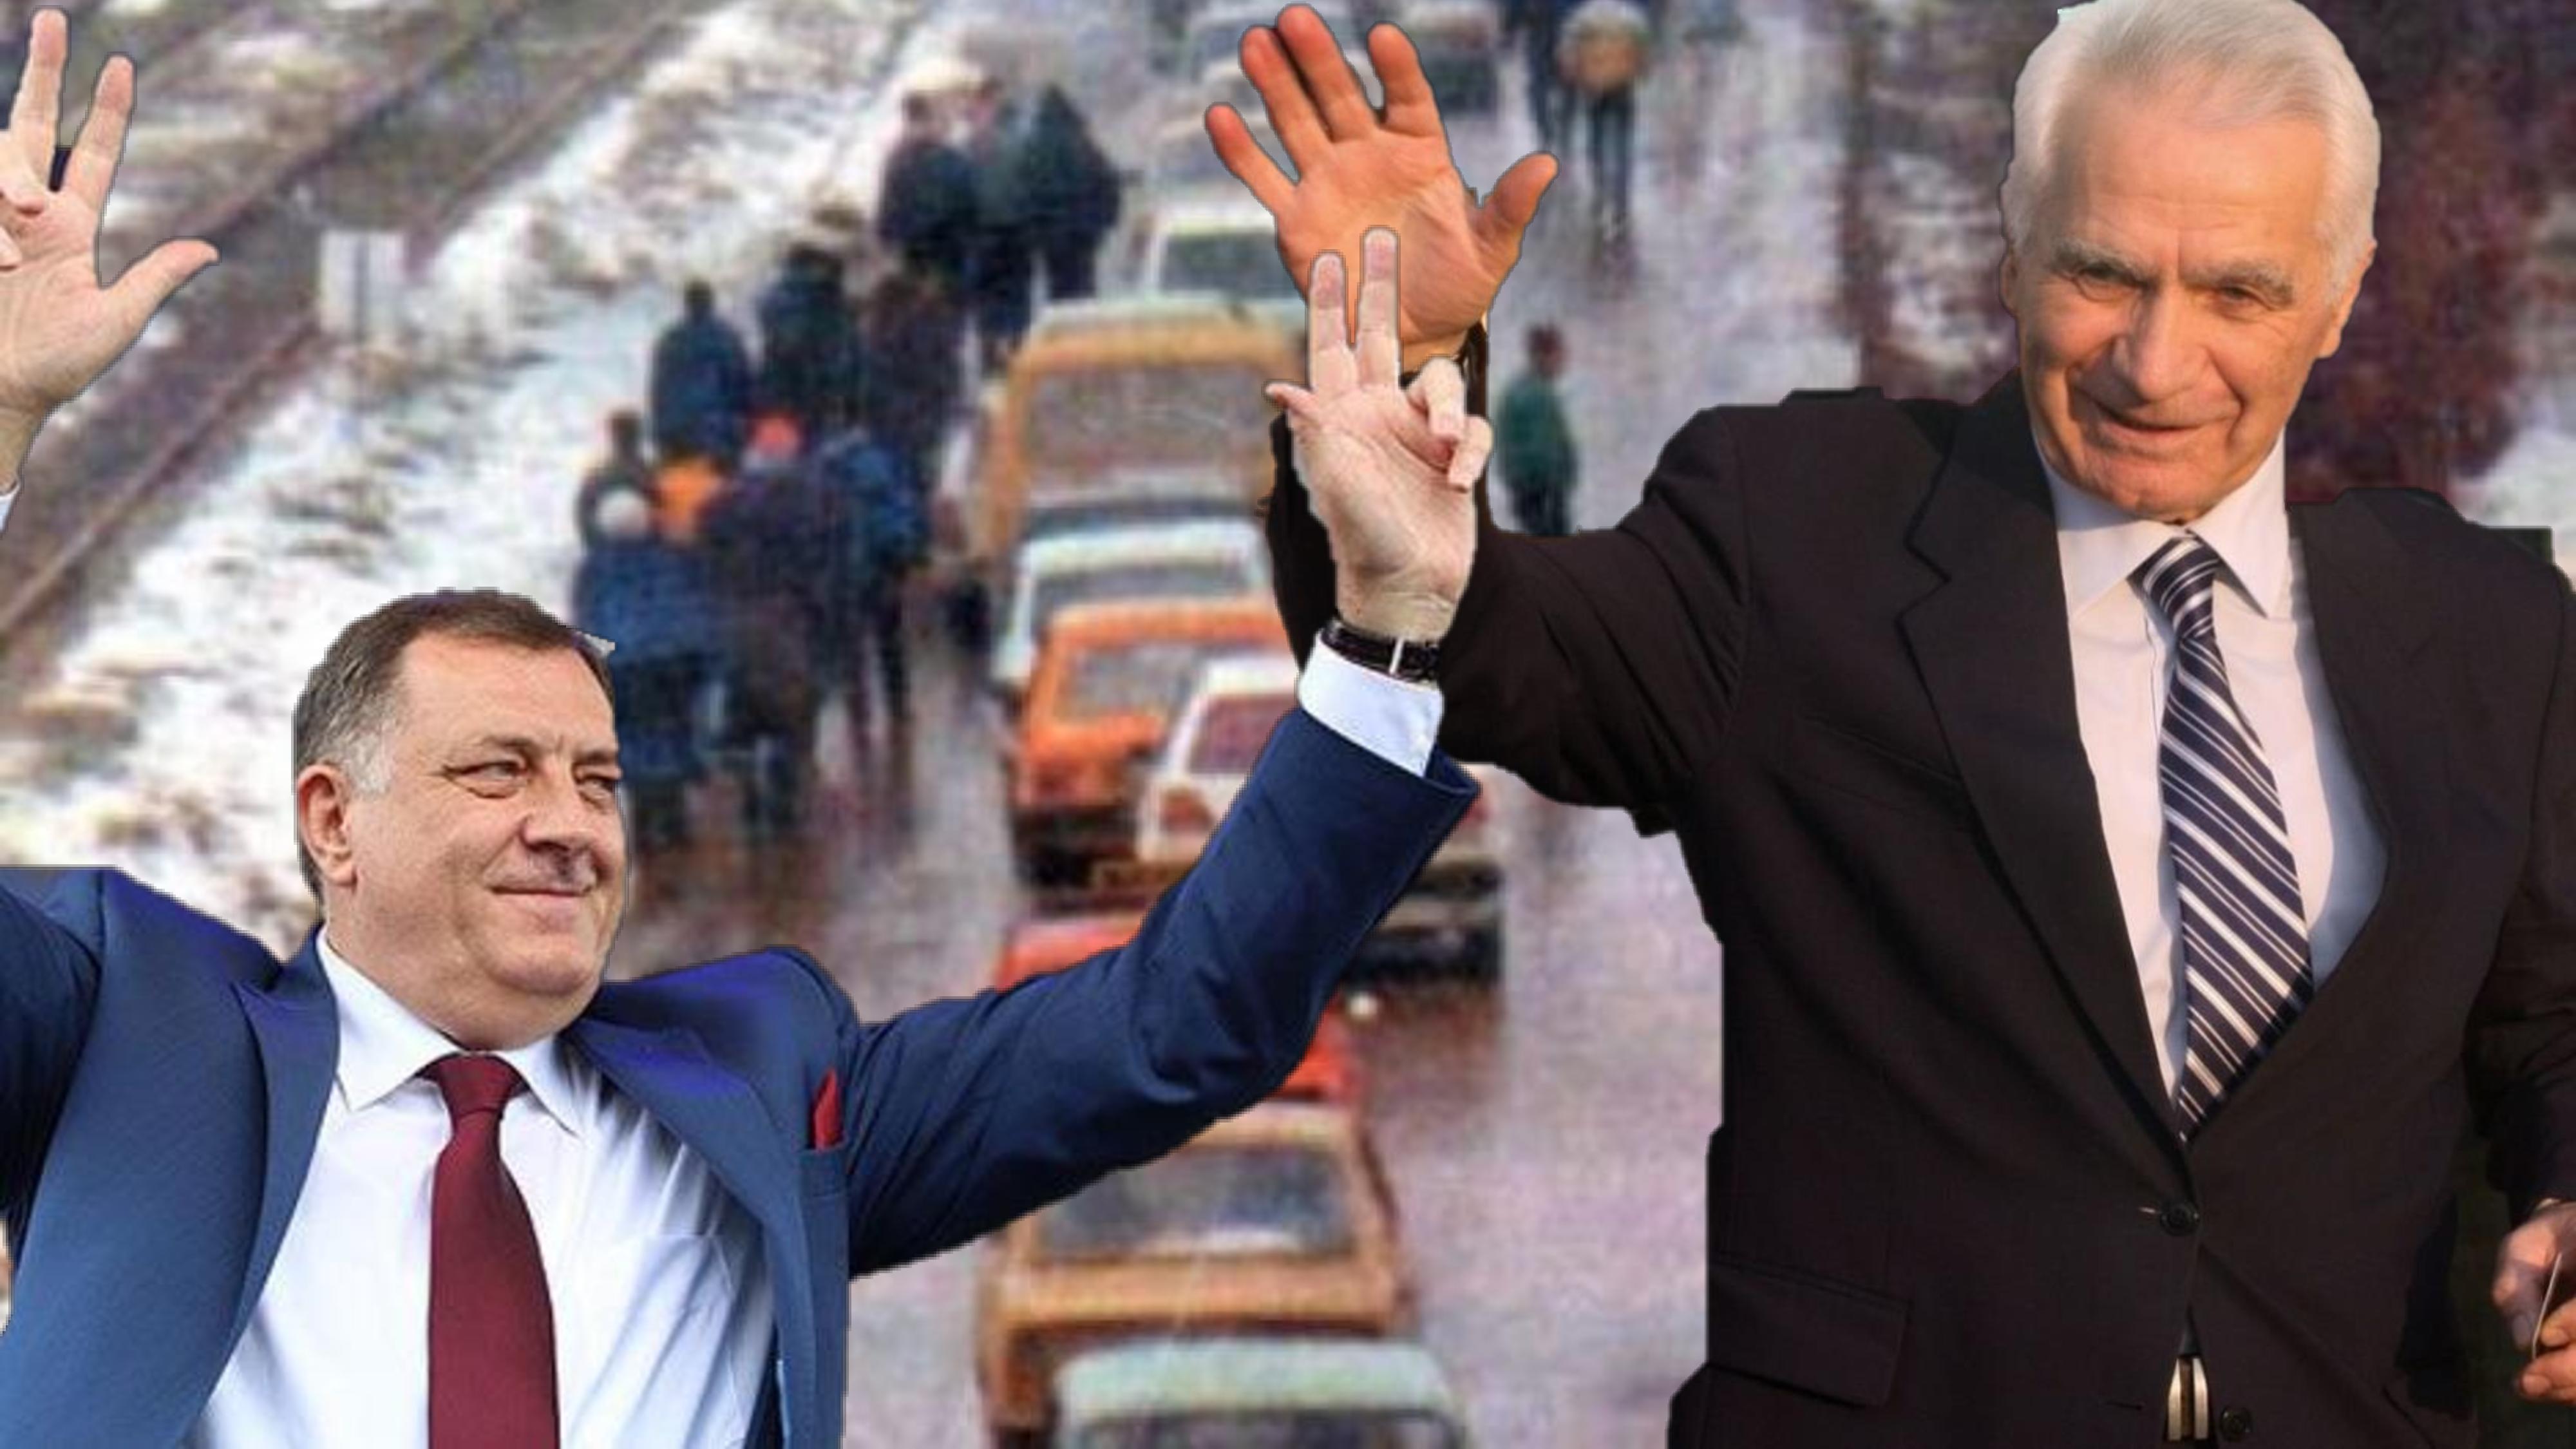 FAKE&SPIN: Egzodus pod okriljem oslobodilačkih ratova RS-a